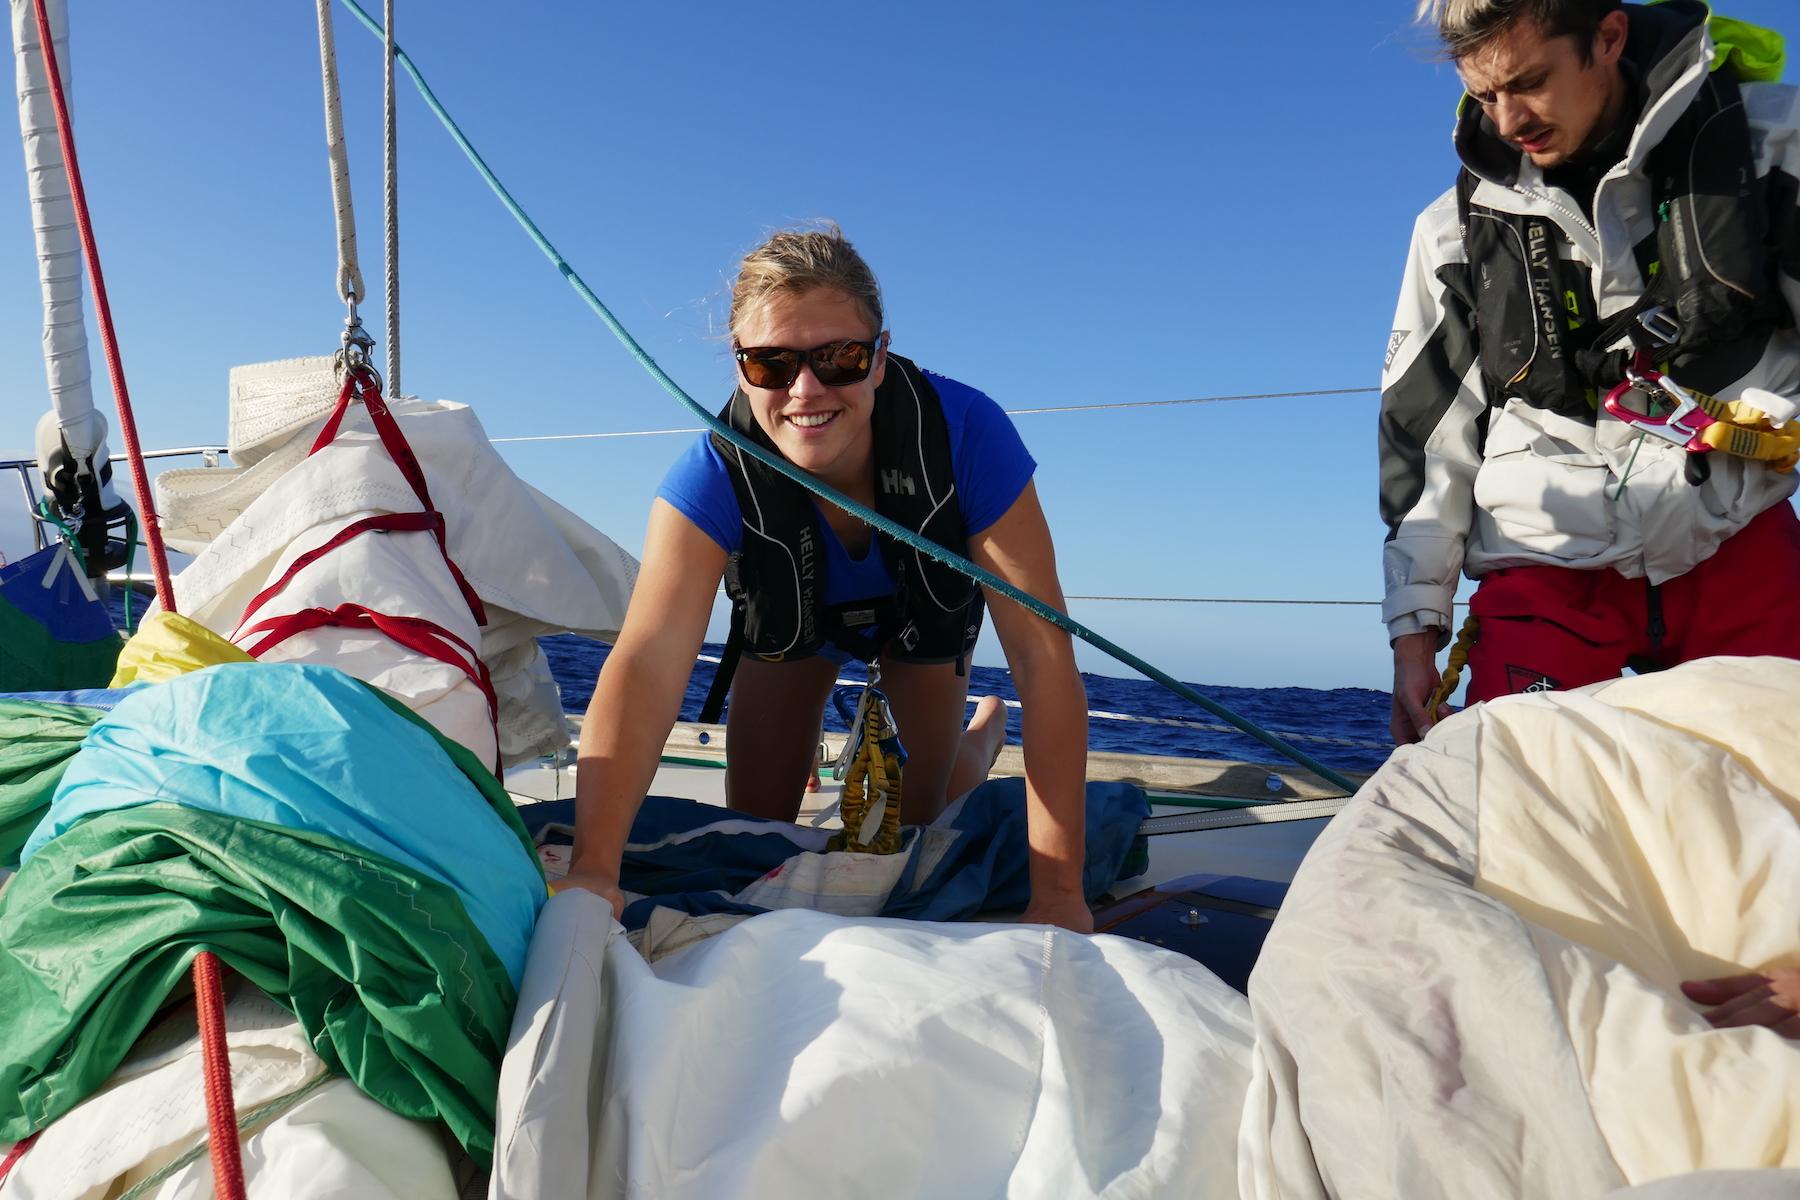 Spinnaker Sailing heading south to the Caribbean. Nov 2016